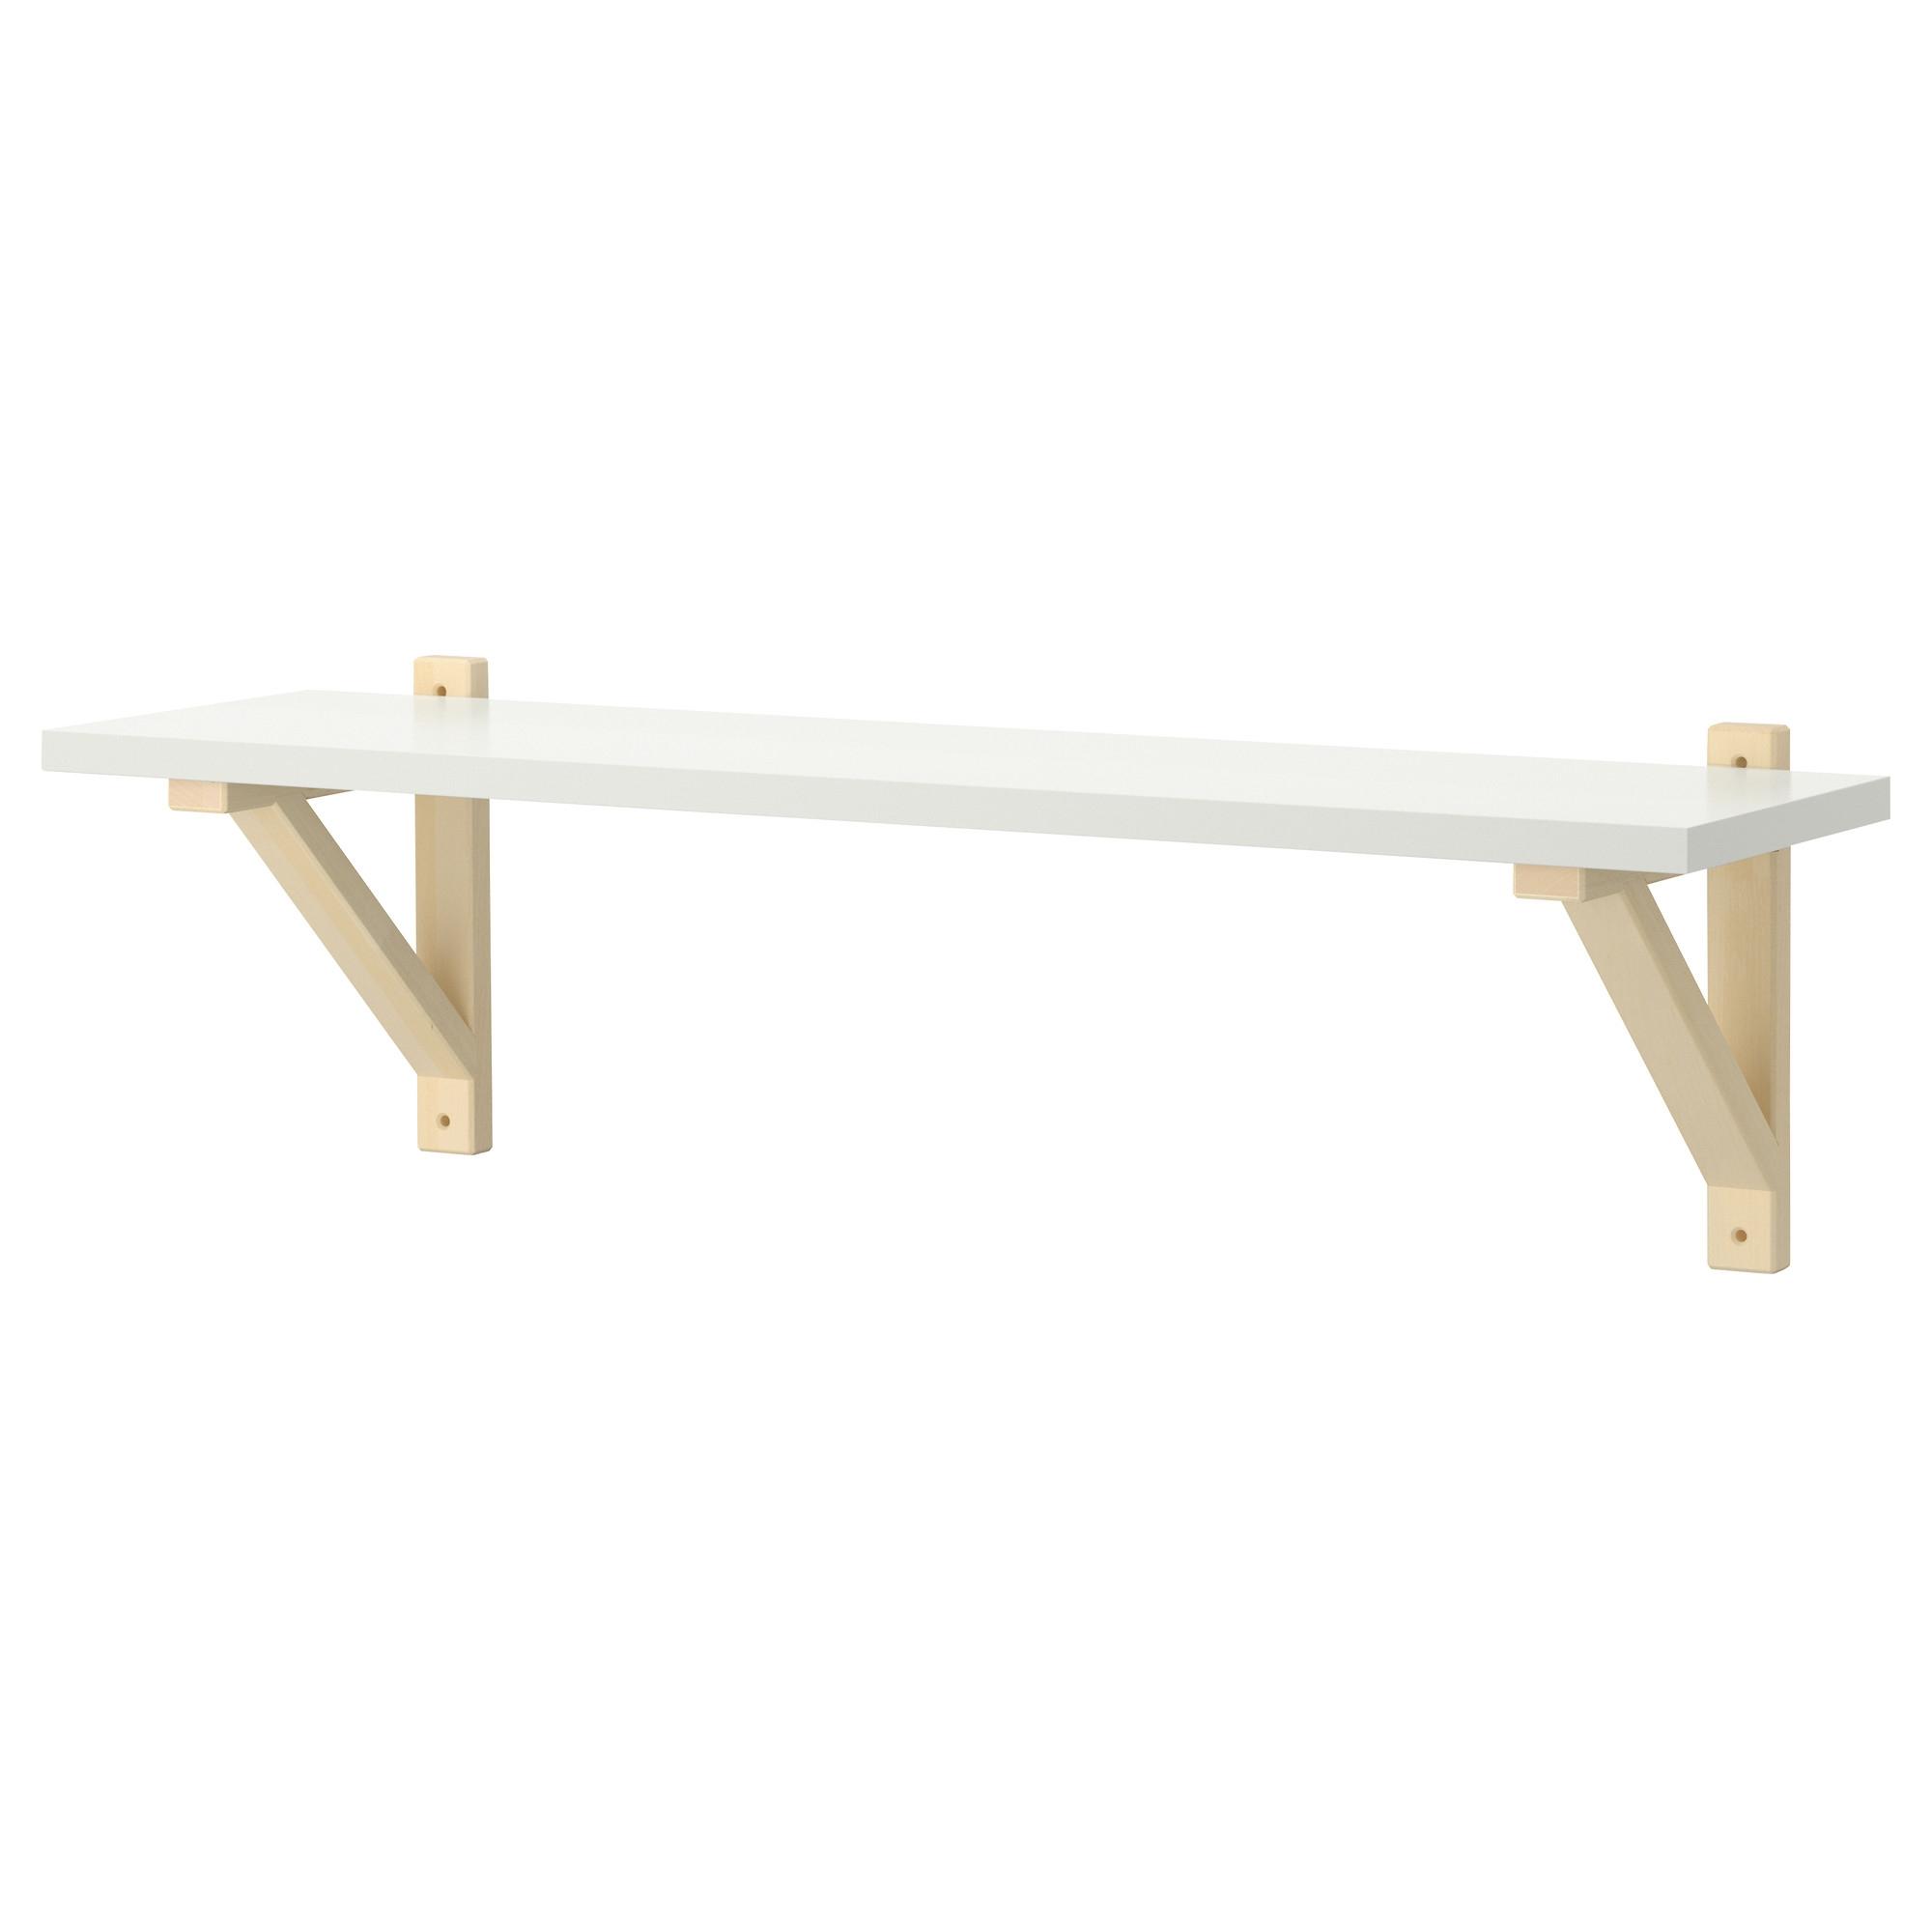 Ek Valterek Sten Wall Shelf Whitebirch 79×19 Cm Ikea For Wall Shelf (#3 of 12)